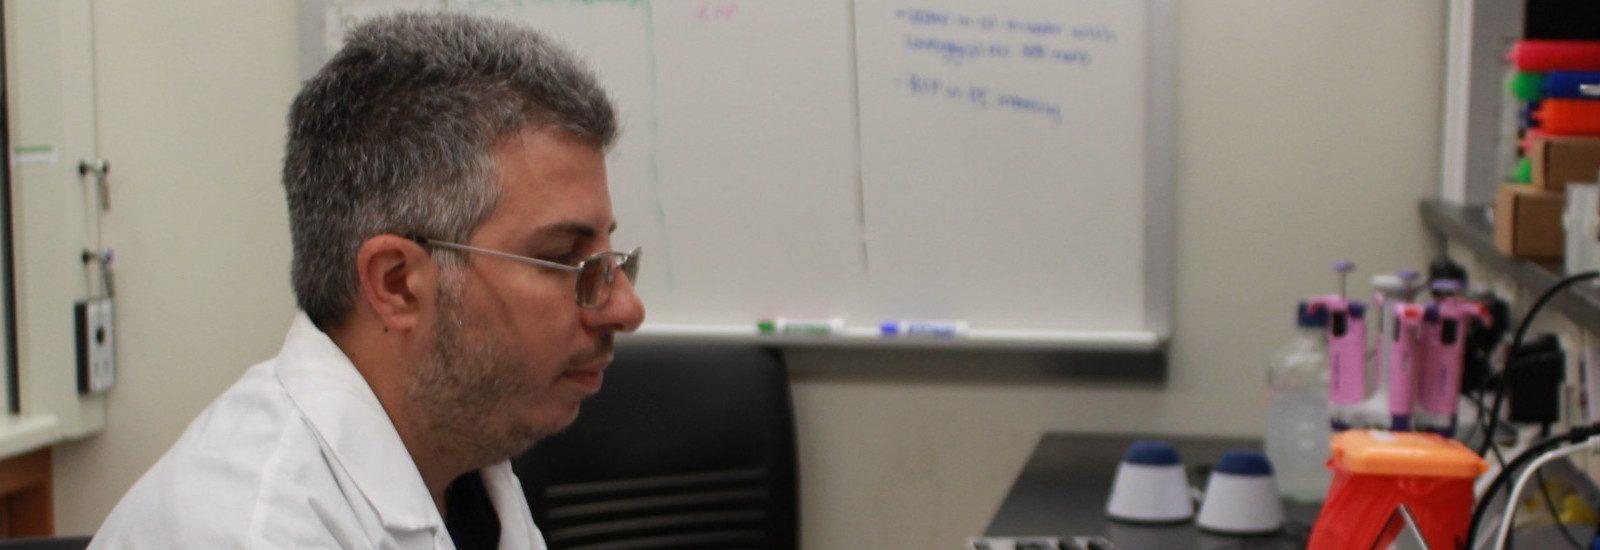 Gaspare Carollo, a biophysics major from Marlton, NJ, conducts research at his summer research internship at Rowan.